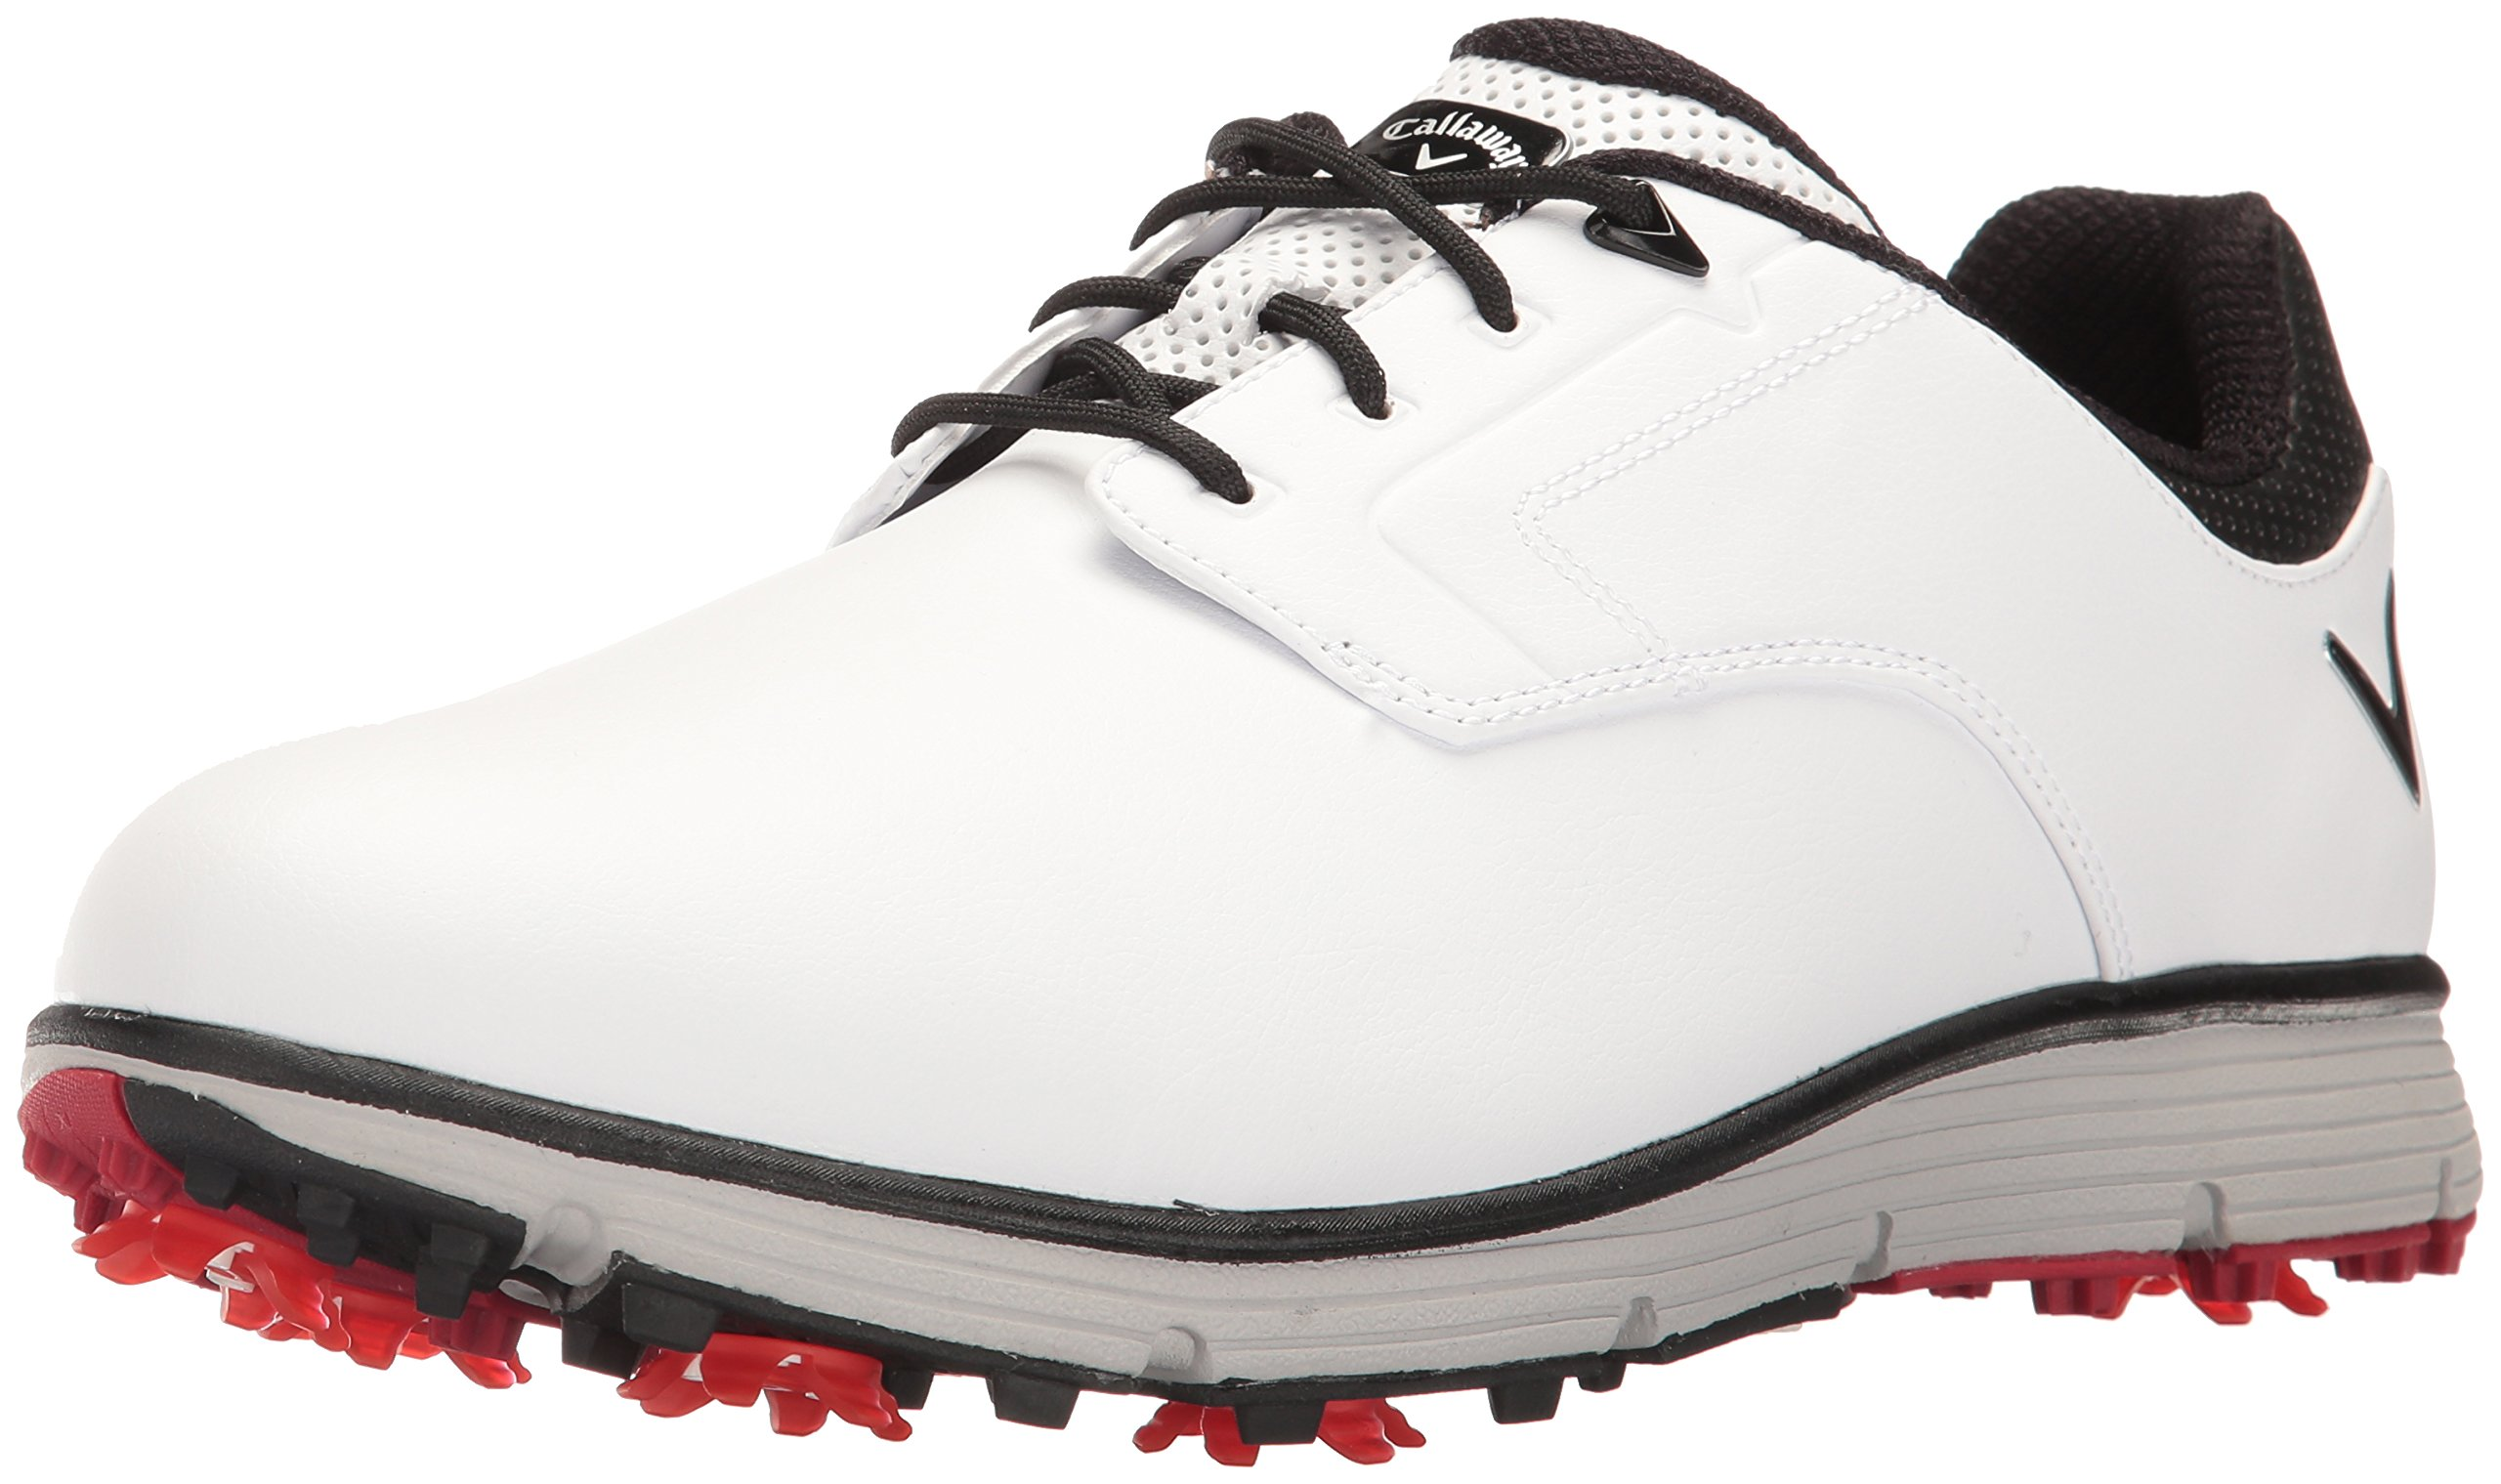 Callaway Men's La Jolla Golf Shoe, White, 14 D US